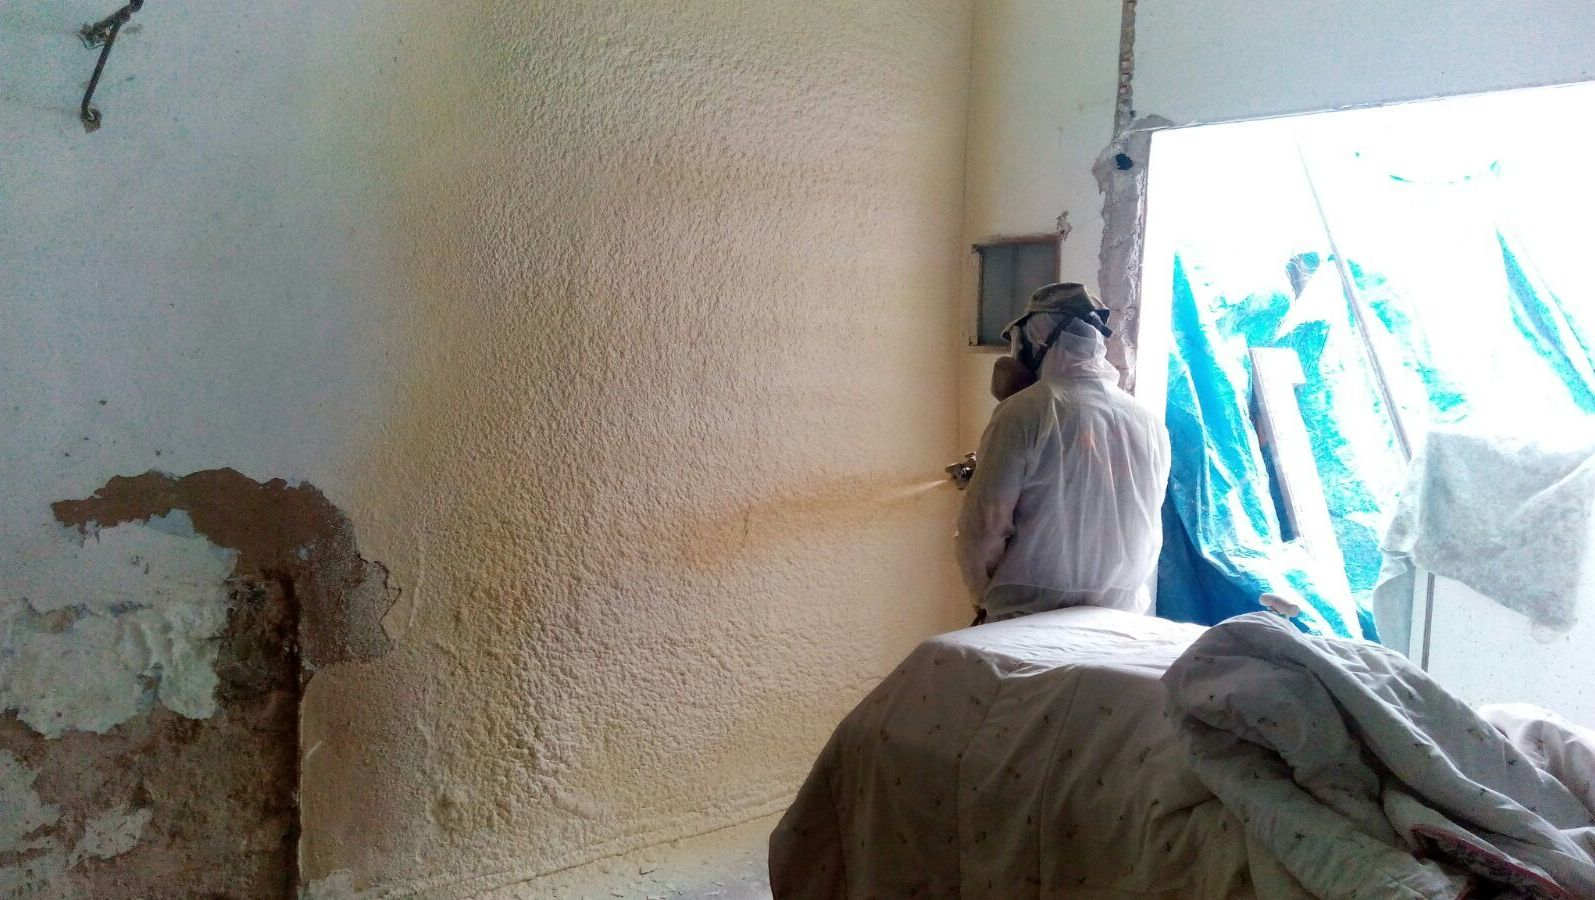 Foto 43 de Aislamientos acústicos y térmicos en Rafelcofer | Aislamientos de Poliuretano Jaime Femenia